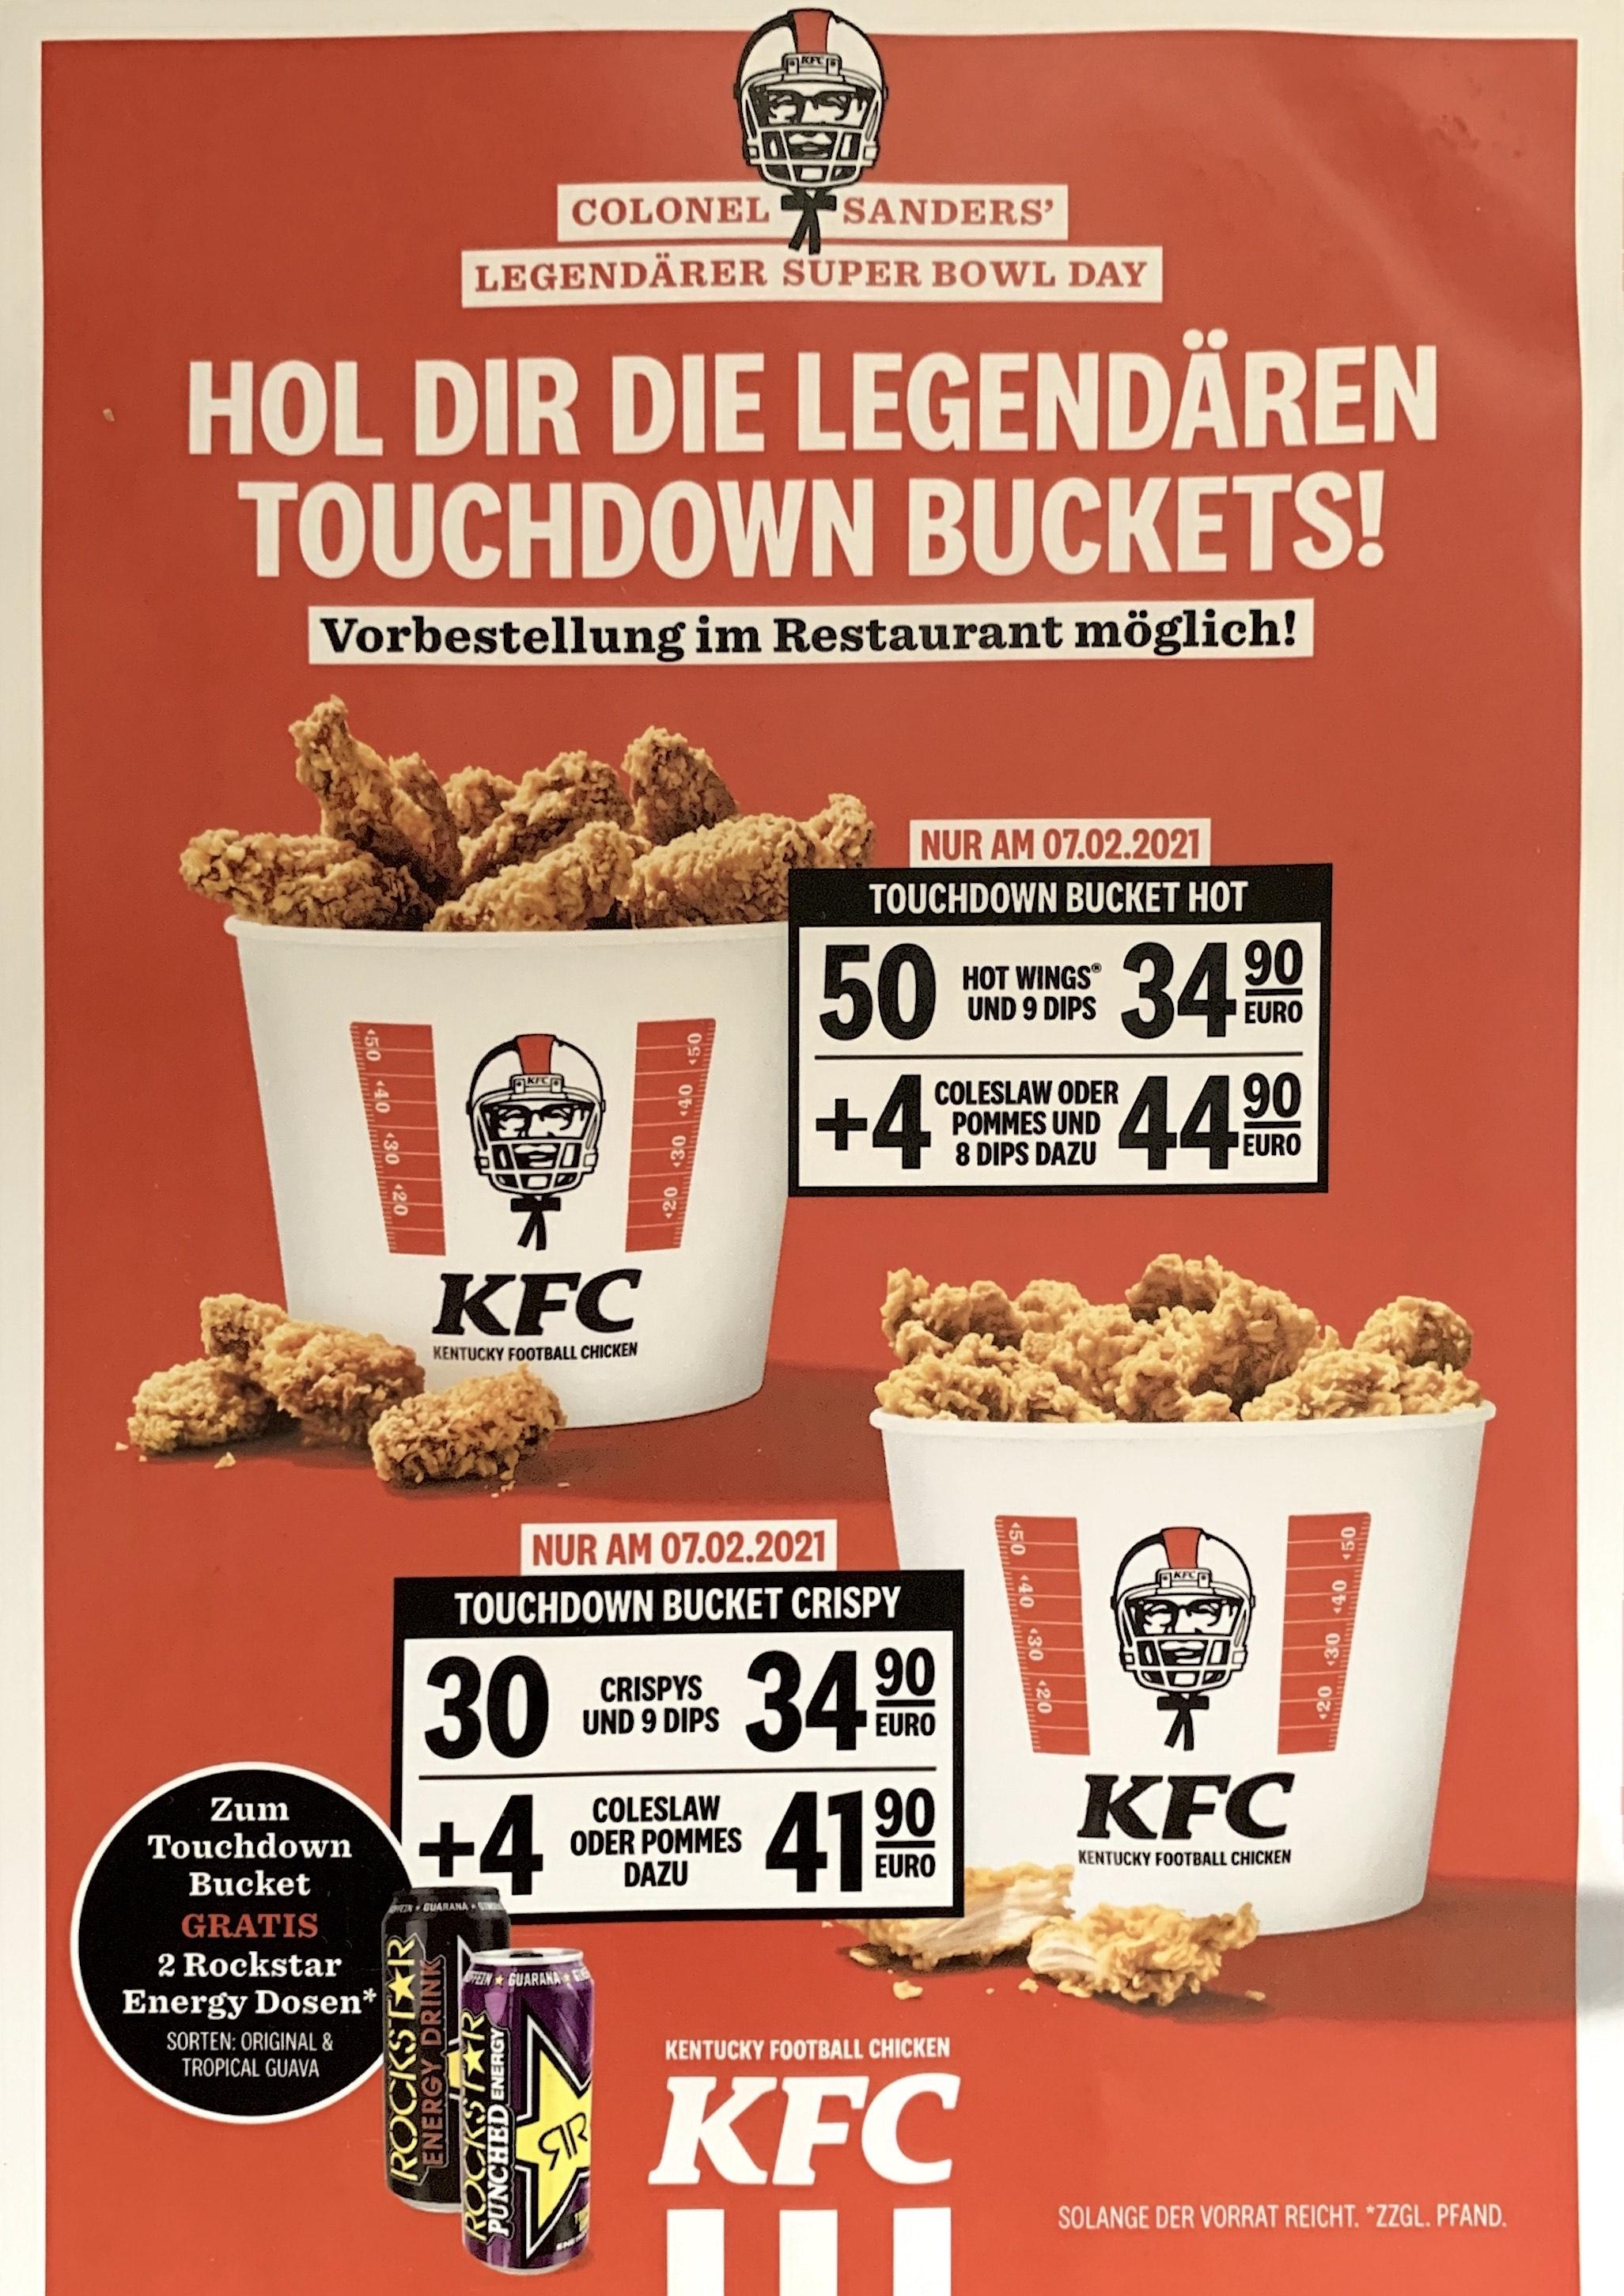 KFC Touchdown Bucket Hot & Crispy